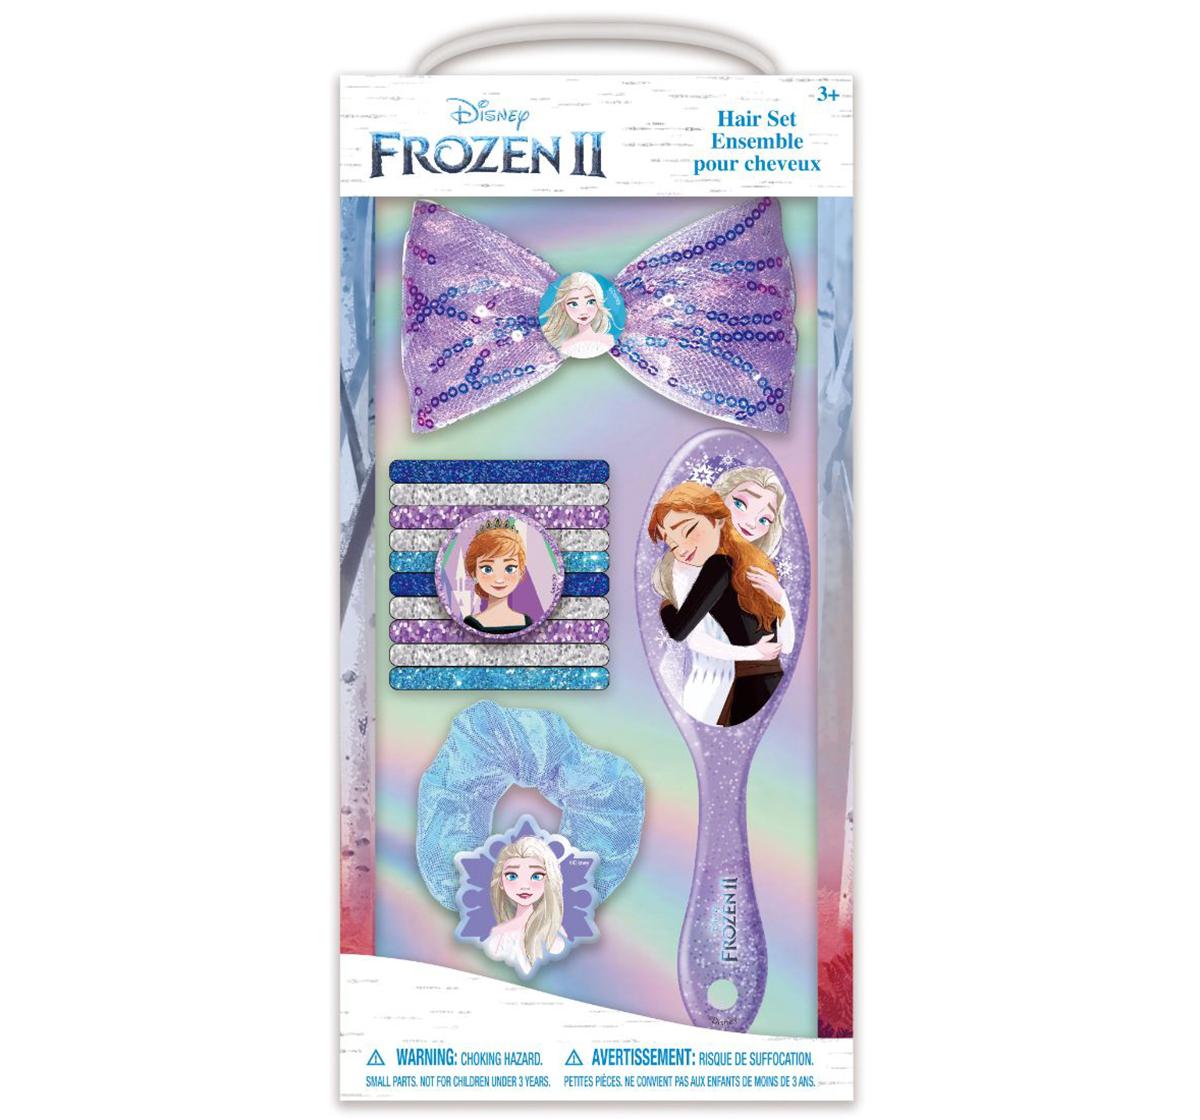 Townley Girl | NE Disney Frozen Glitter Accessories with Brush for Girls age 5Y+